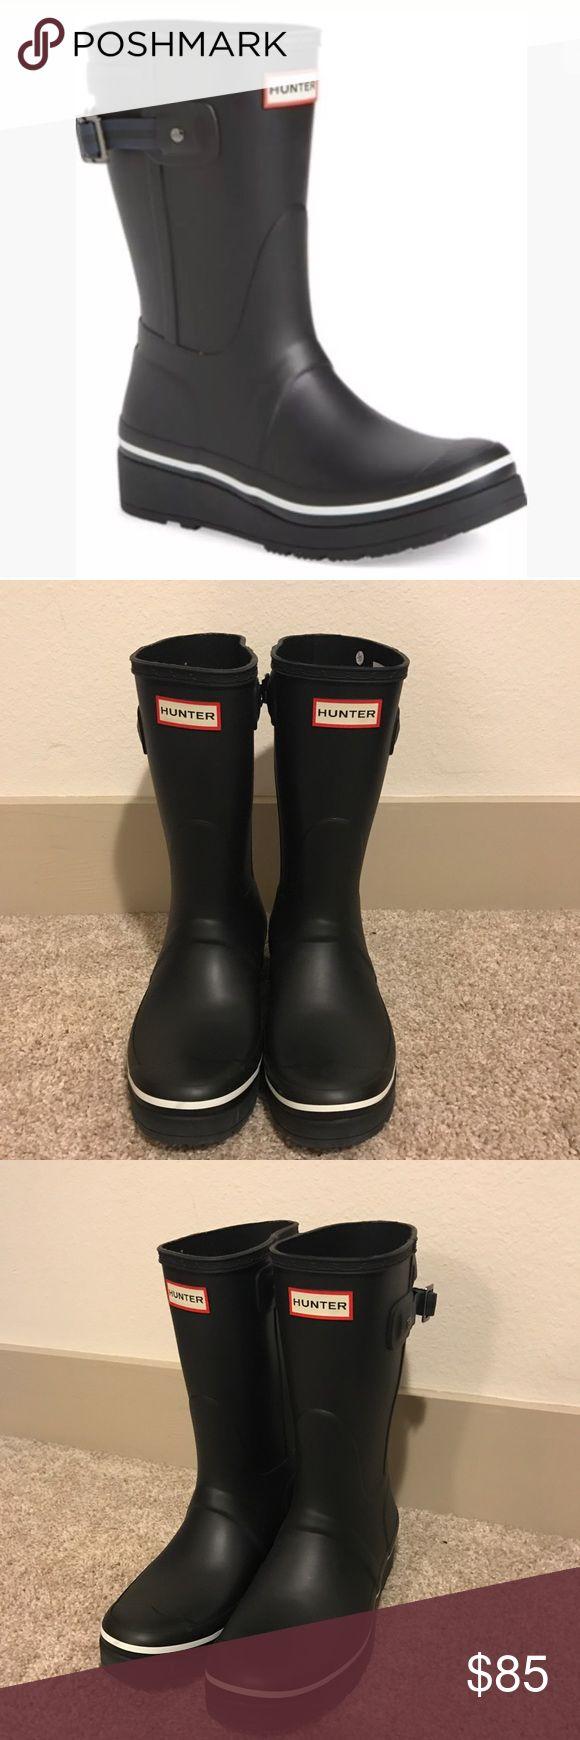 Hunter Original Short Wedge Rain Boots New 8 Hunter Original Short Wedge Rain Boots New without box was a display model Size 8 Women's Black Hunter Shoes Winter & Rain Boots